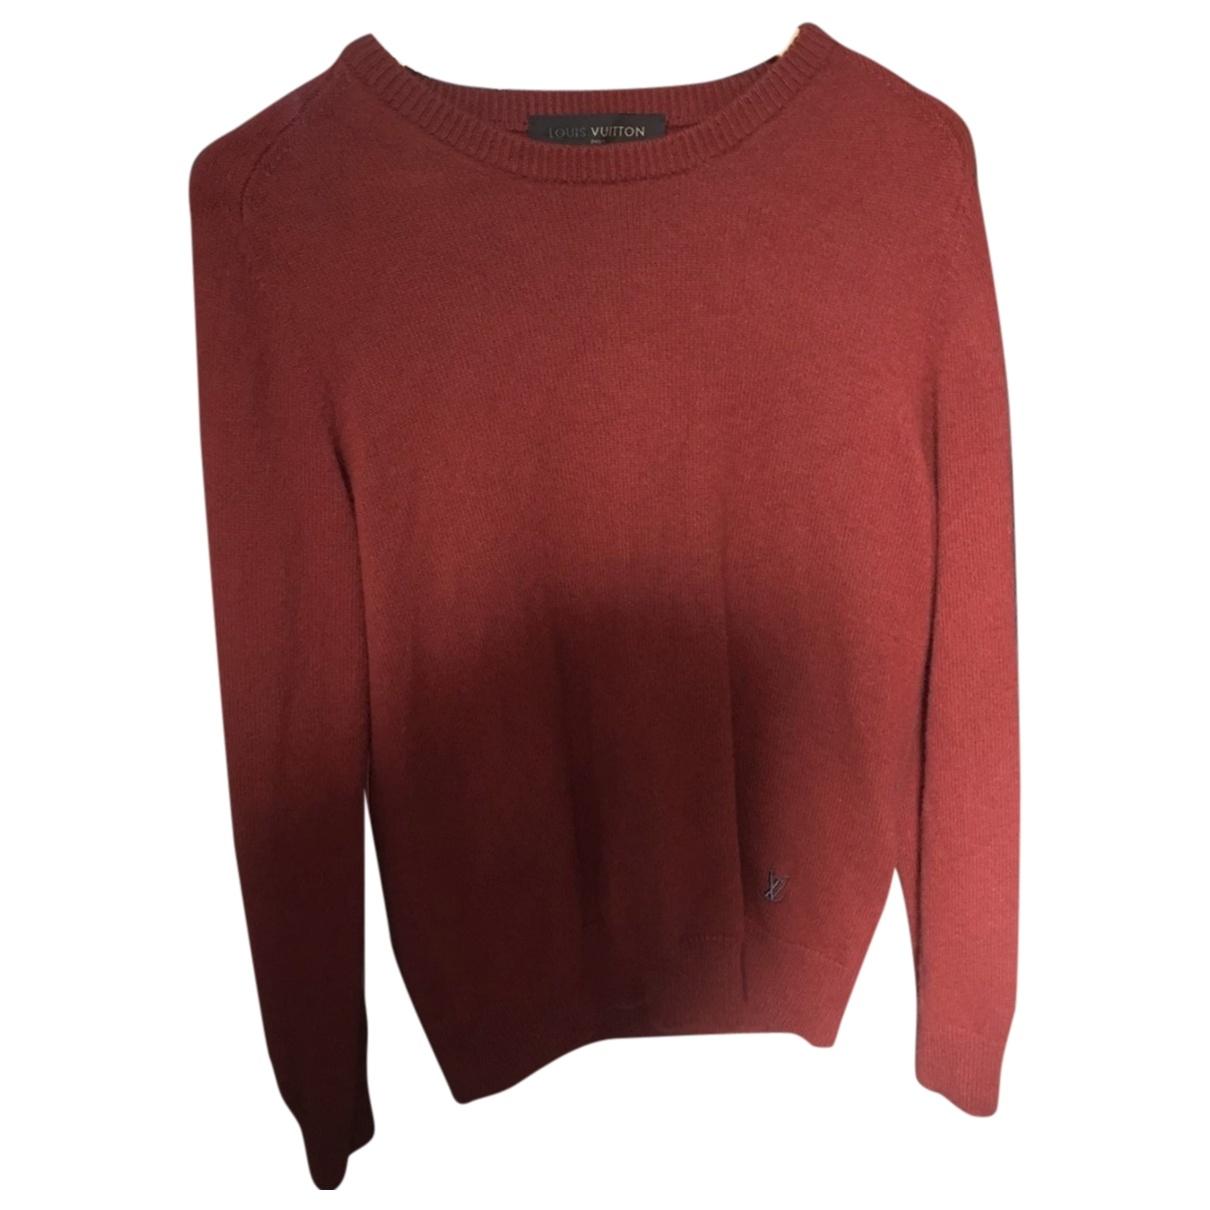 Louis Vuitton \N Burgundy Cashmere Knitwear & Sweatshirts for Men M International